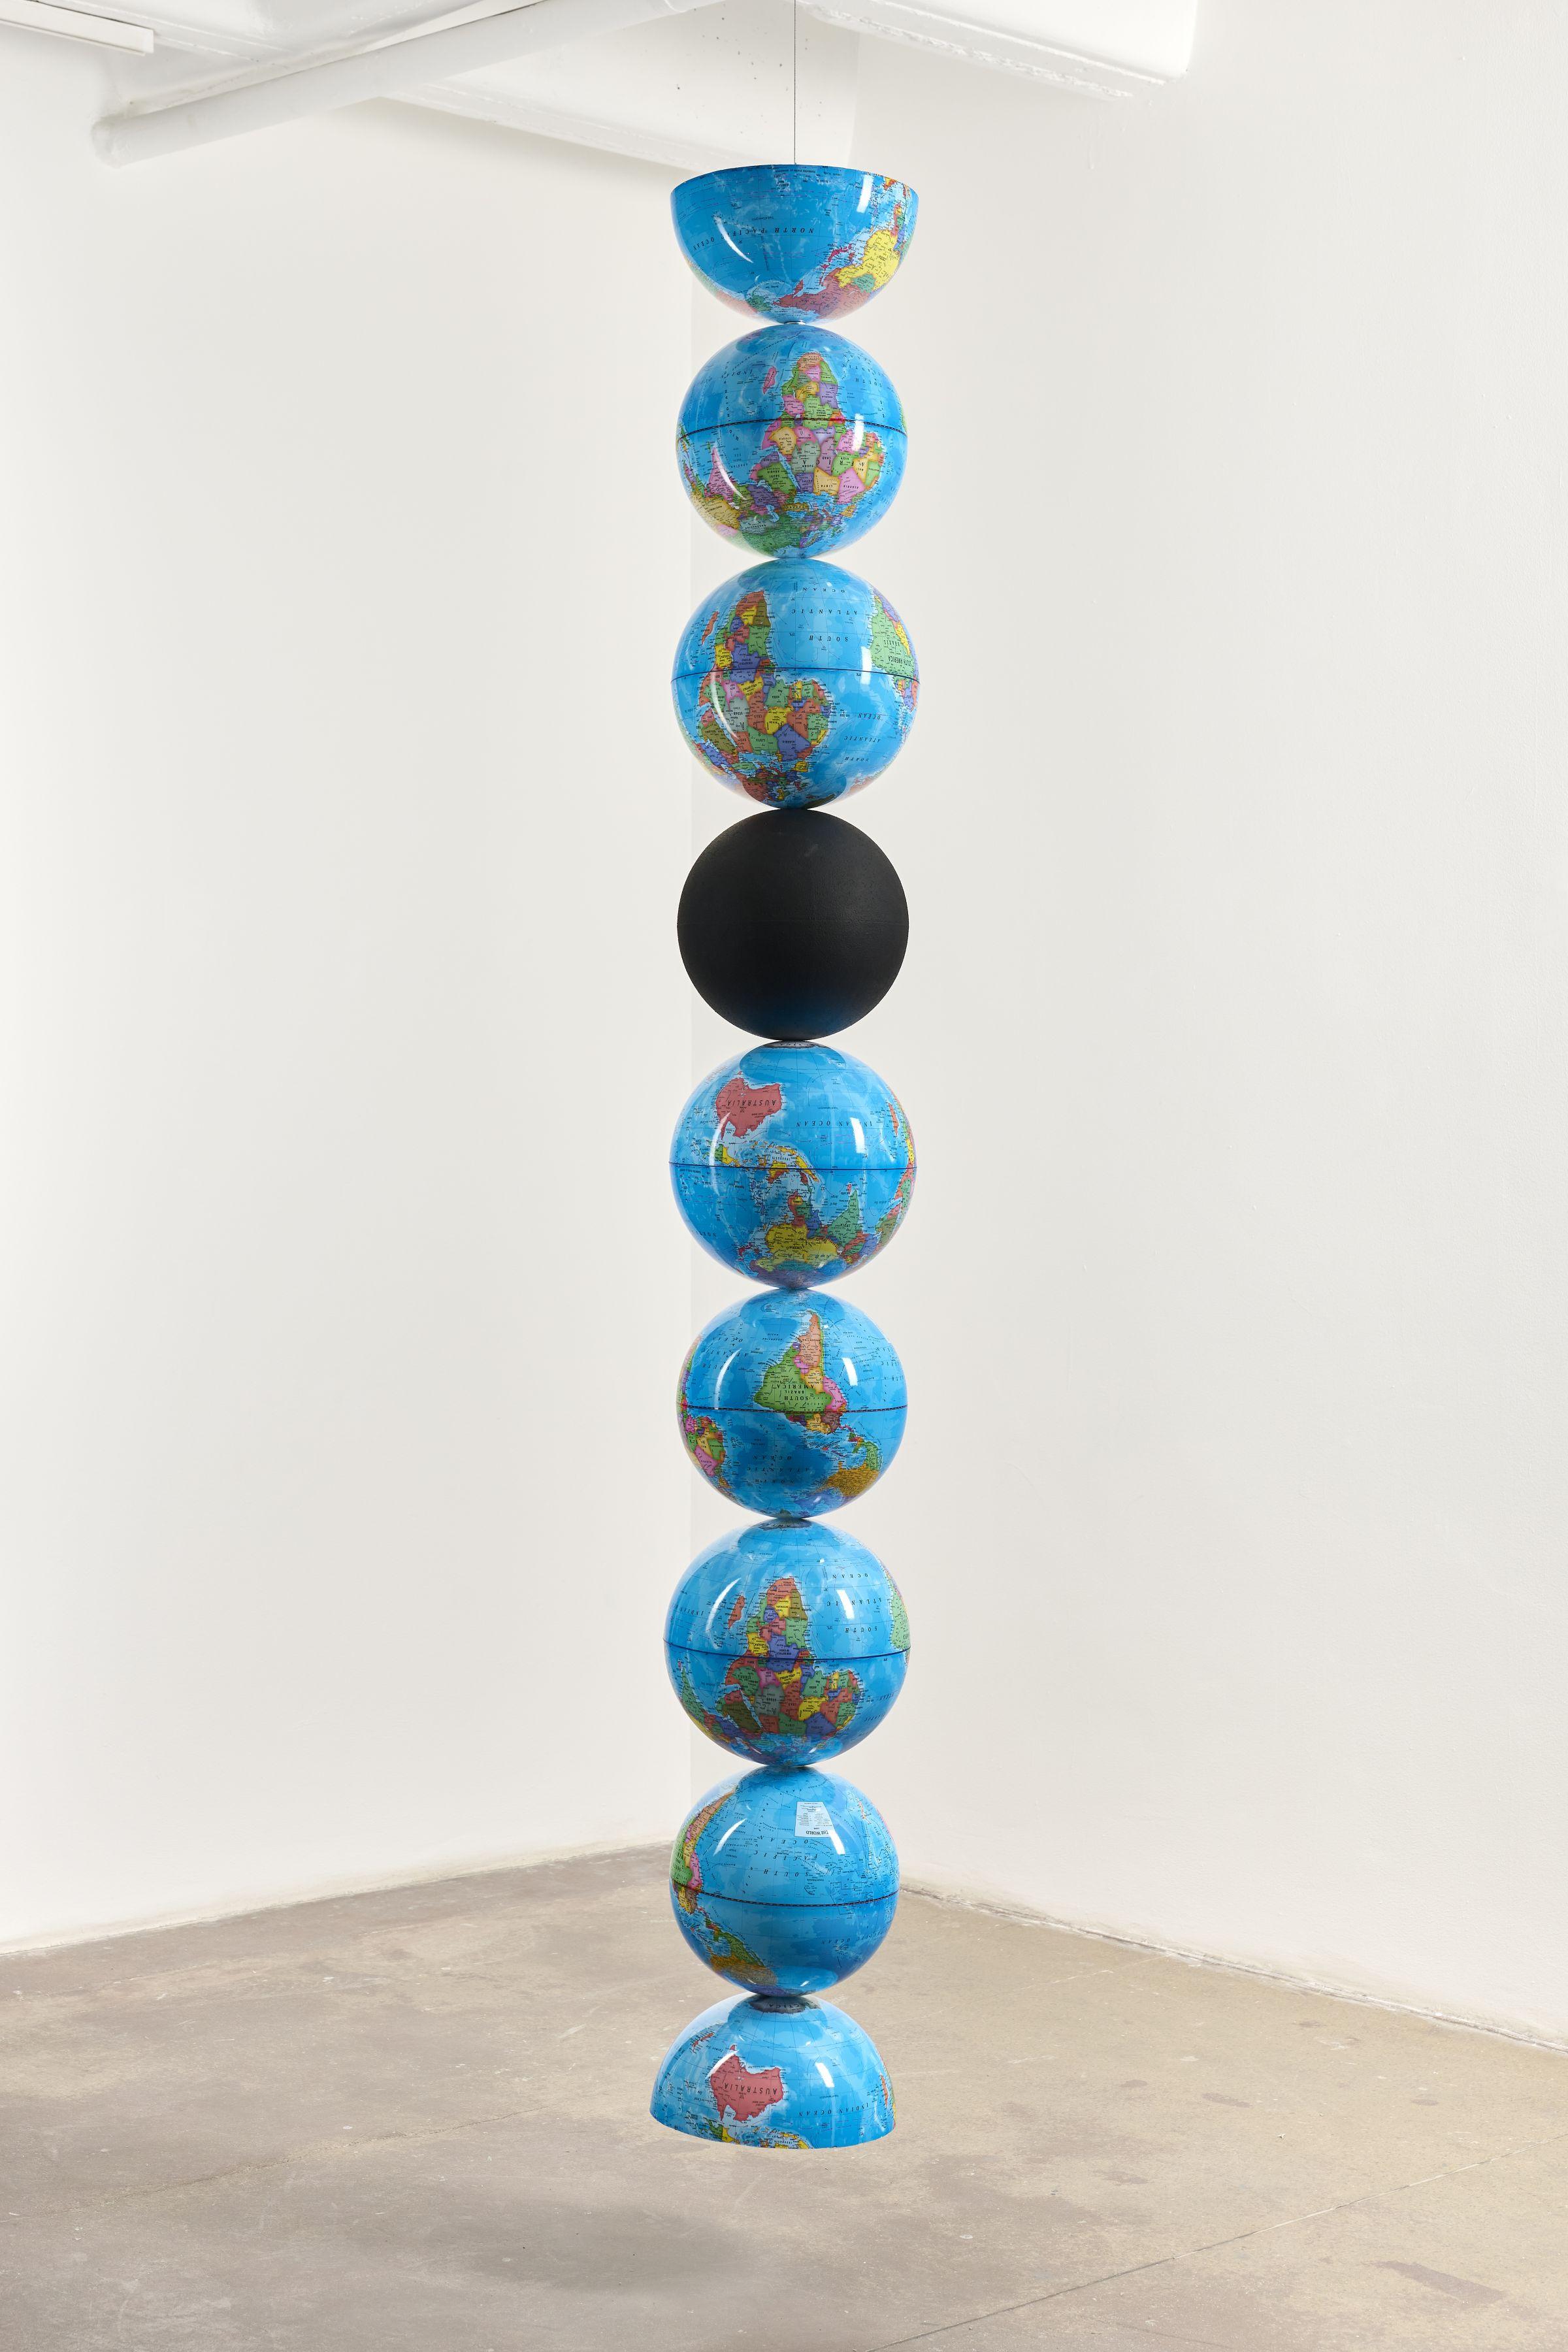 model for an endless column artwork